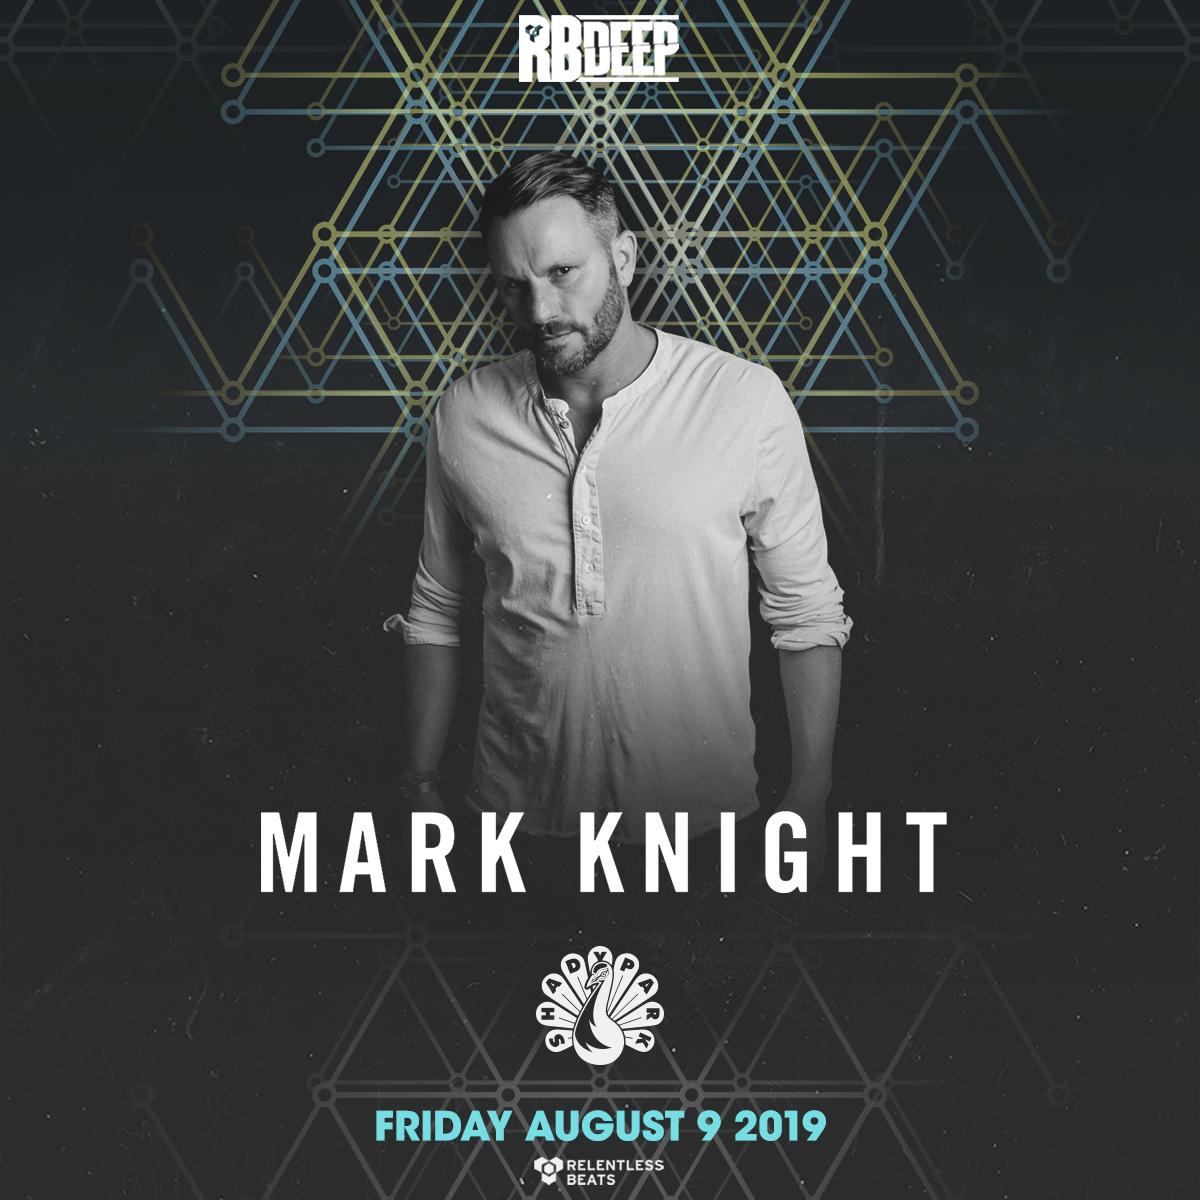 Flyer for Mark Knight